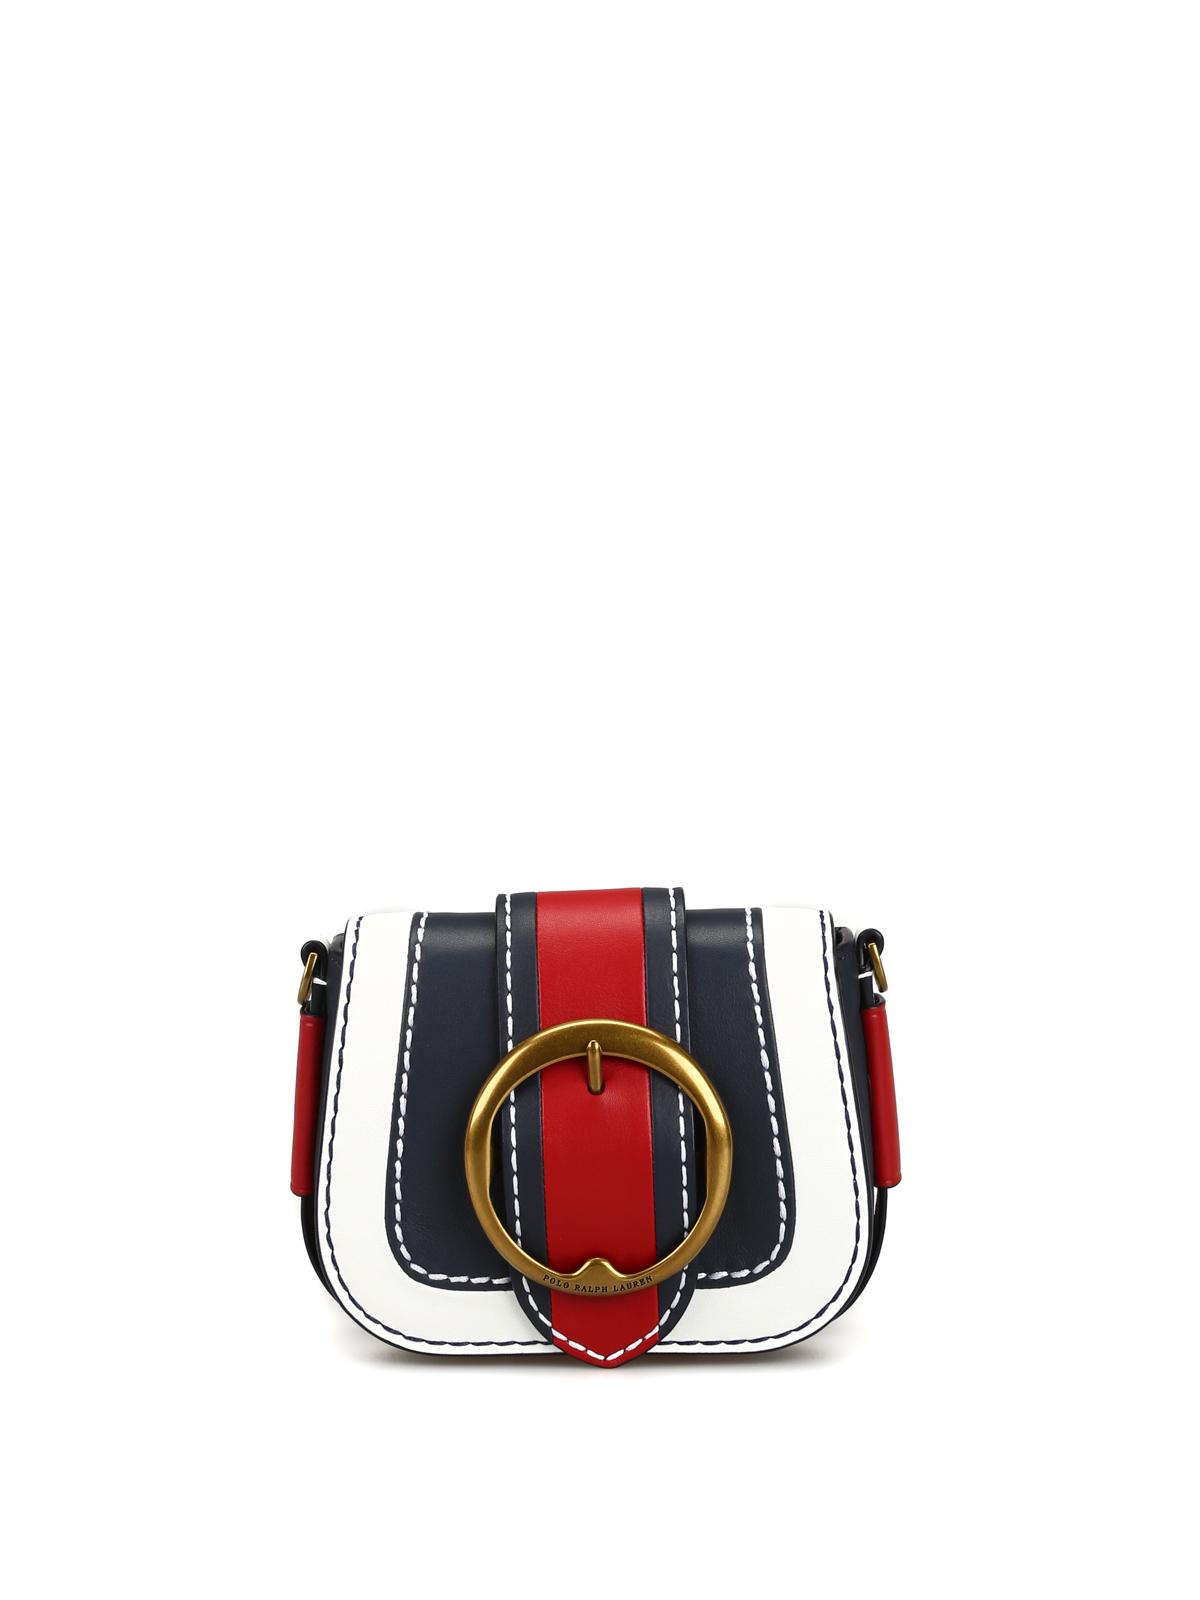 bb66889172 Lennox Mini tricolour leather shoulder bag - POLO RALPH LAUREN - Paolo  Fiorillo